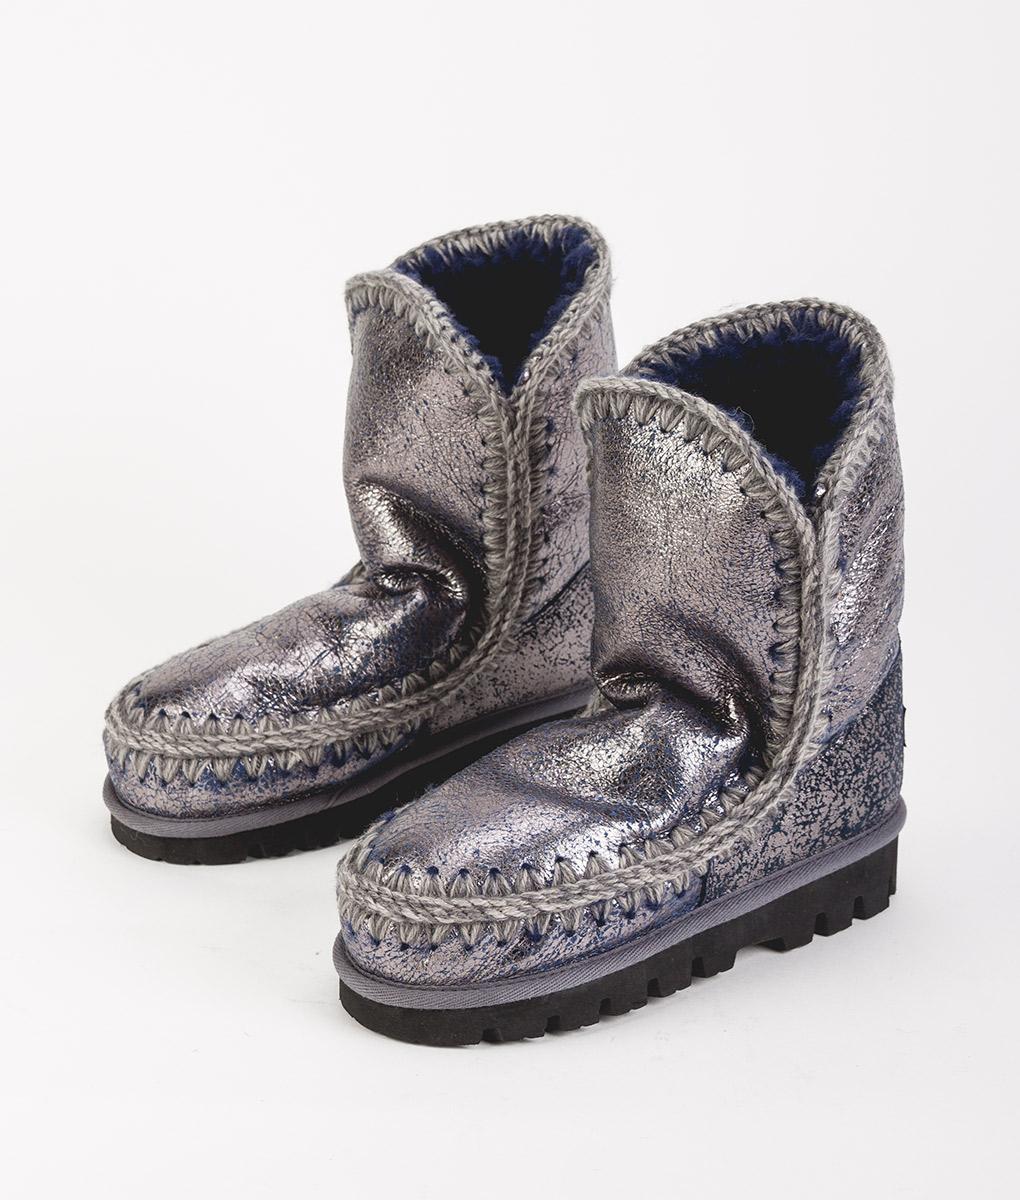 MOU Women Ankle Boots ESKIMO BOOT 24 MOUNTIN OUTSOLE, Silver Navy 269.99